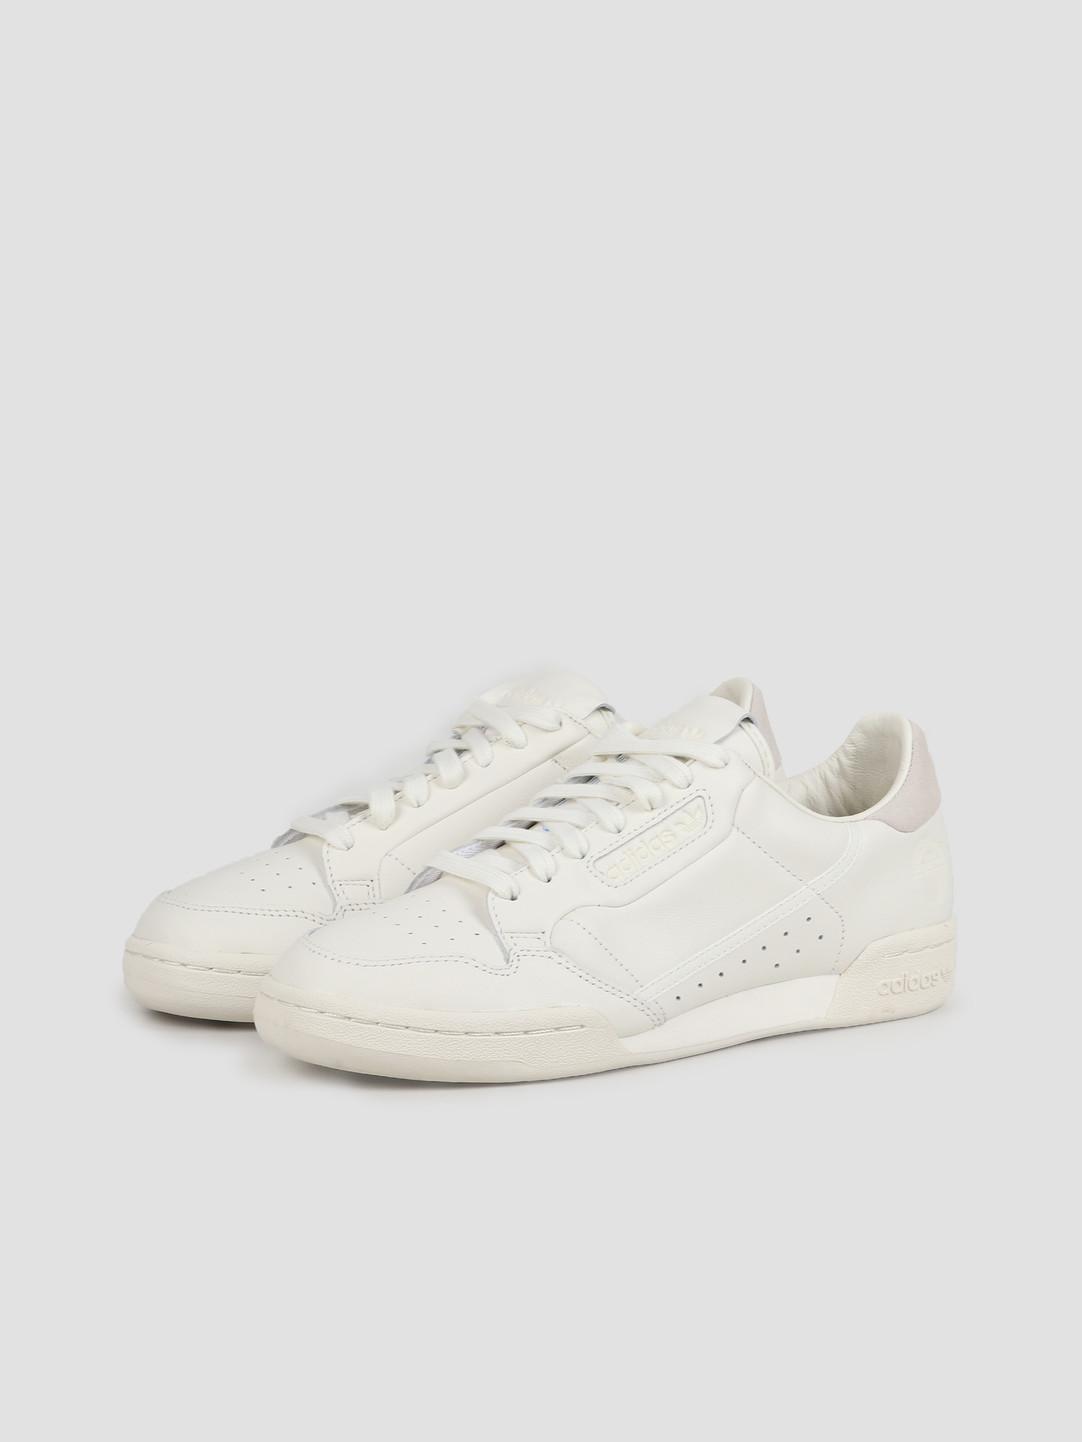 adidas adidas Continental 80 Off White EG6719